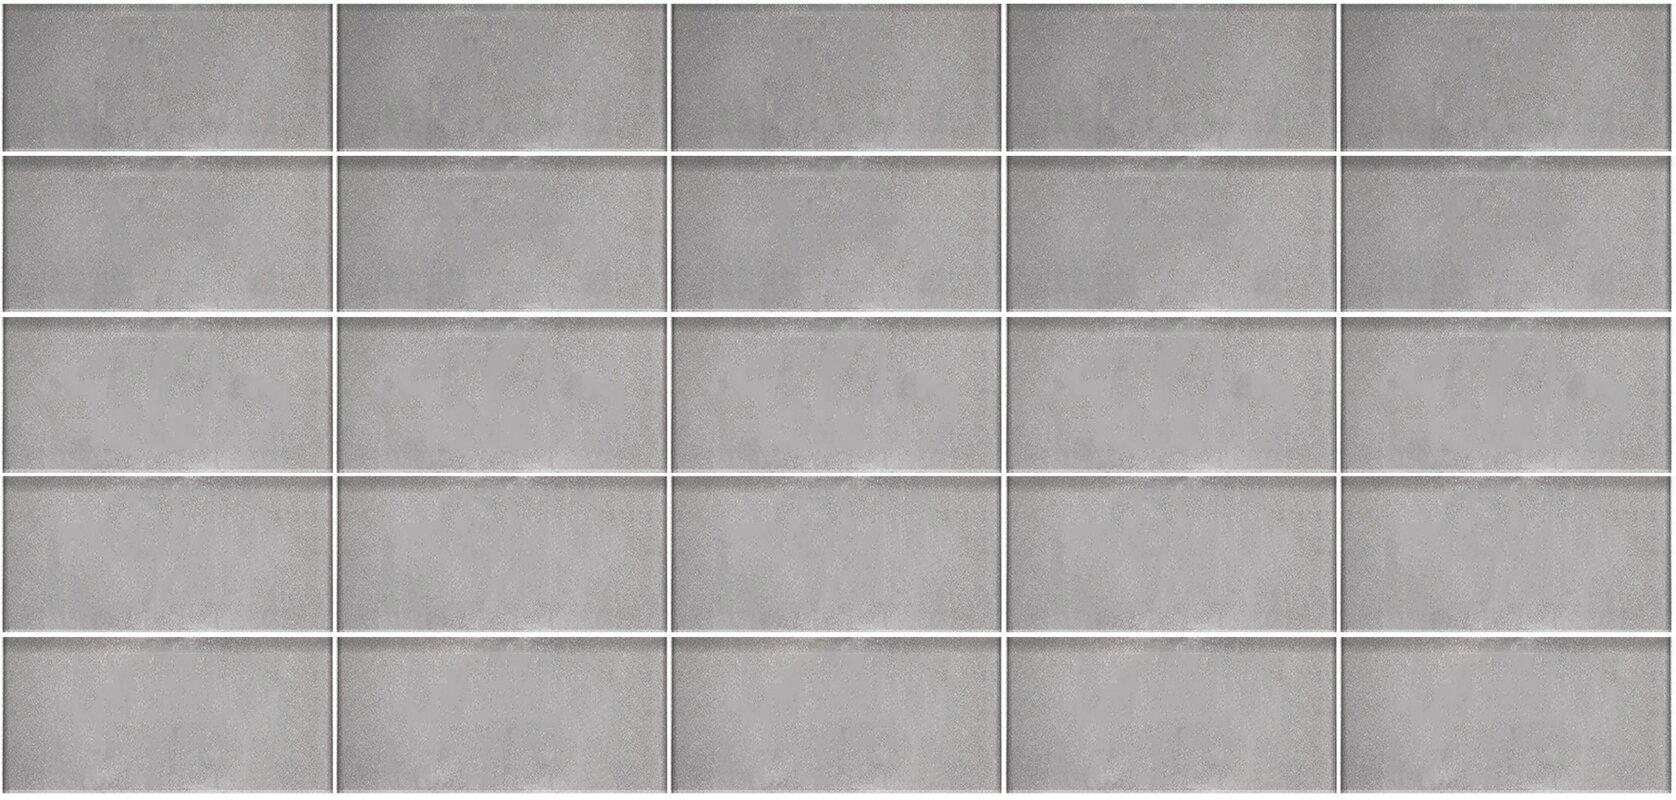 Abolos secret dimensions 3 x 6 glass subway tile in dark silver secret dimensions 3 x 6 glass subway tile in dark silver dailygadgetfo Gallery